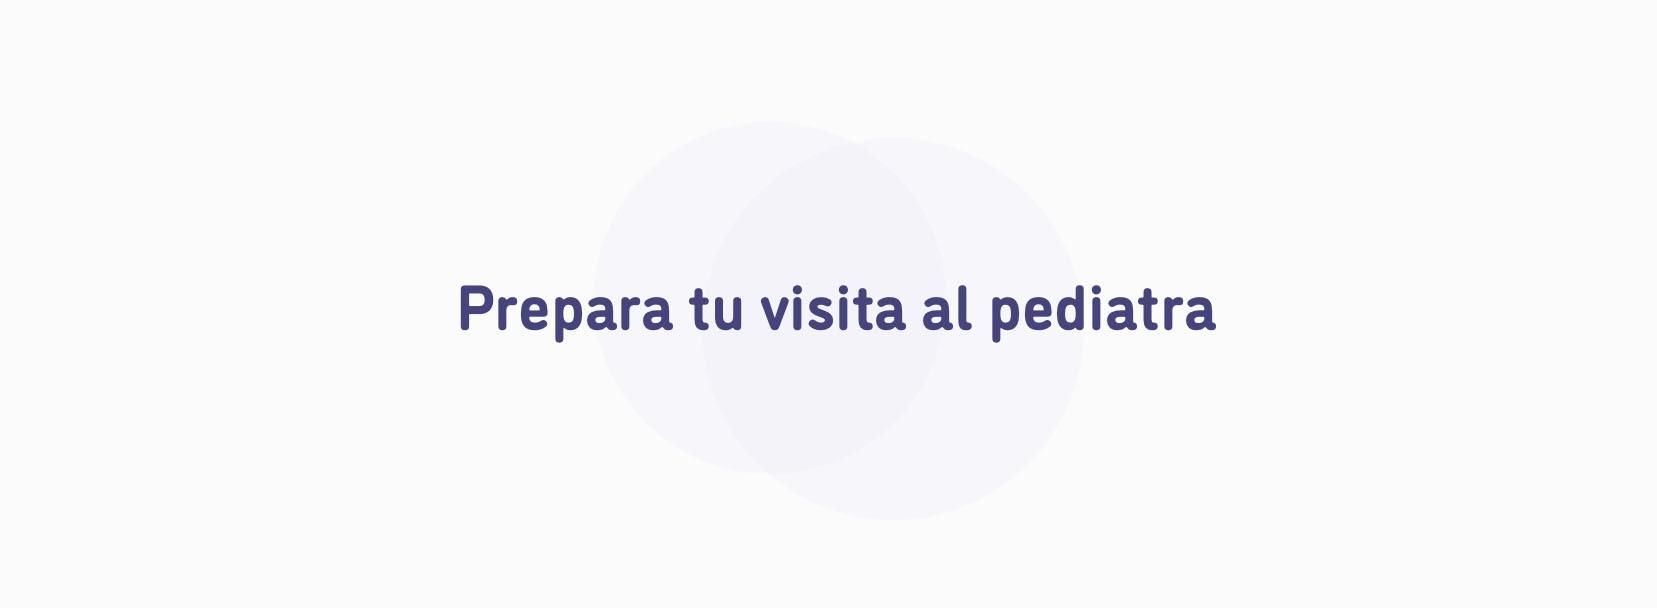 Prepara tu visita al pediatra